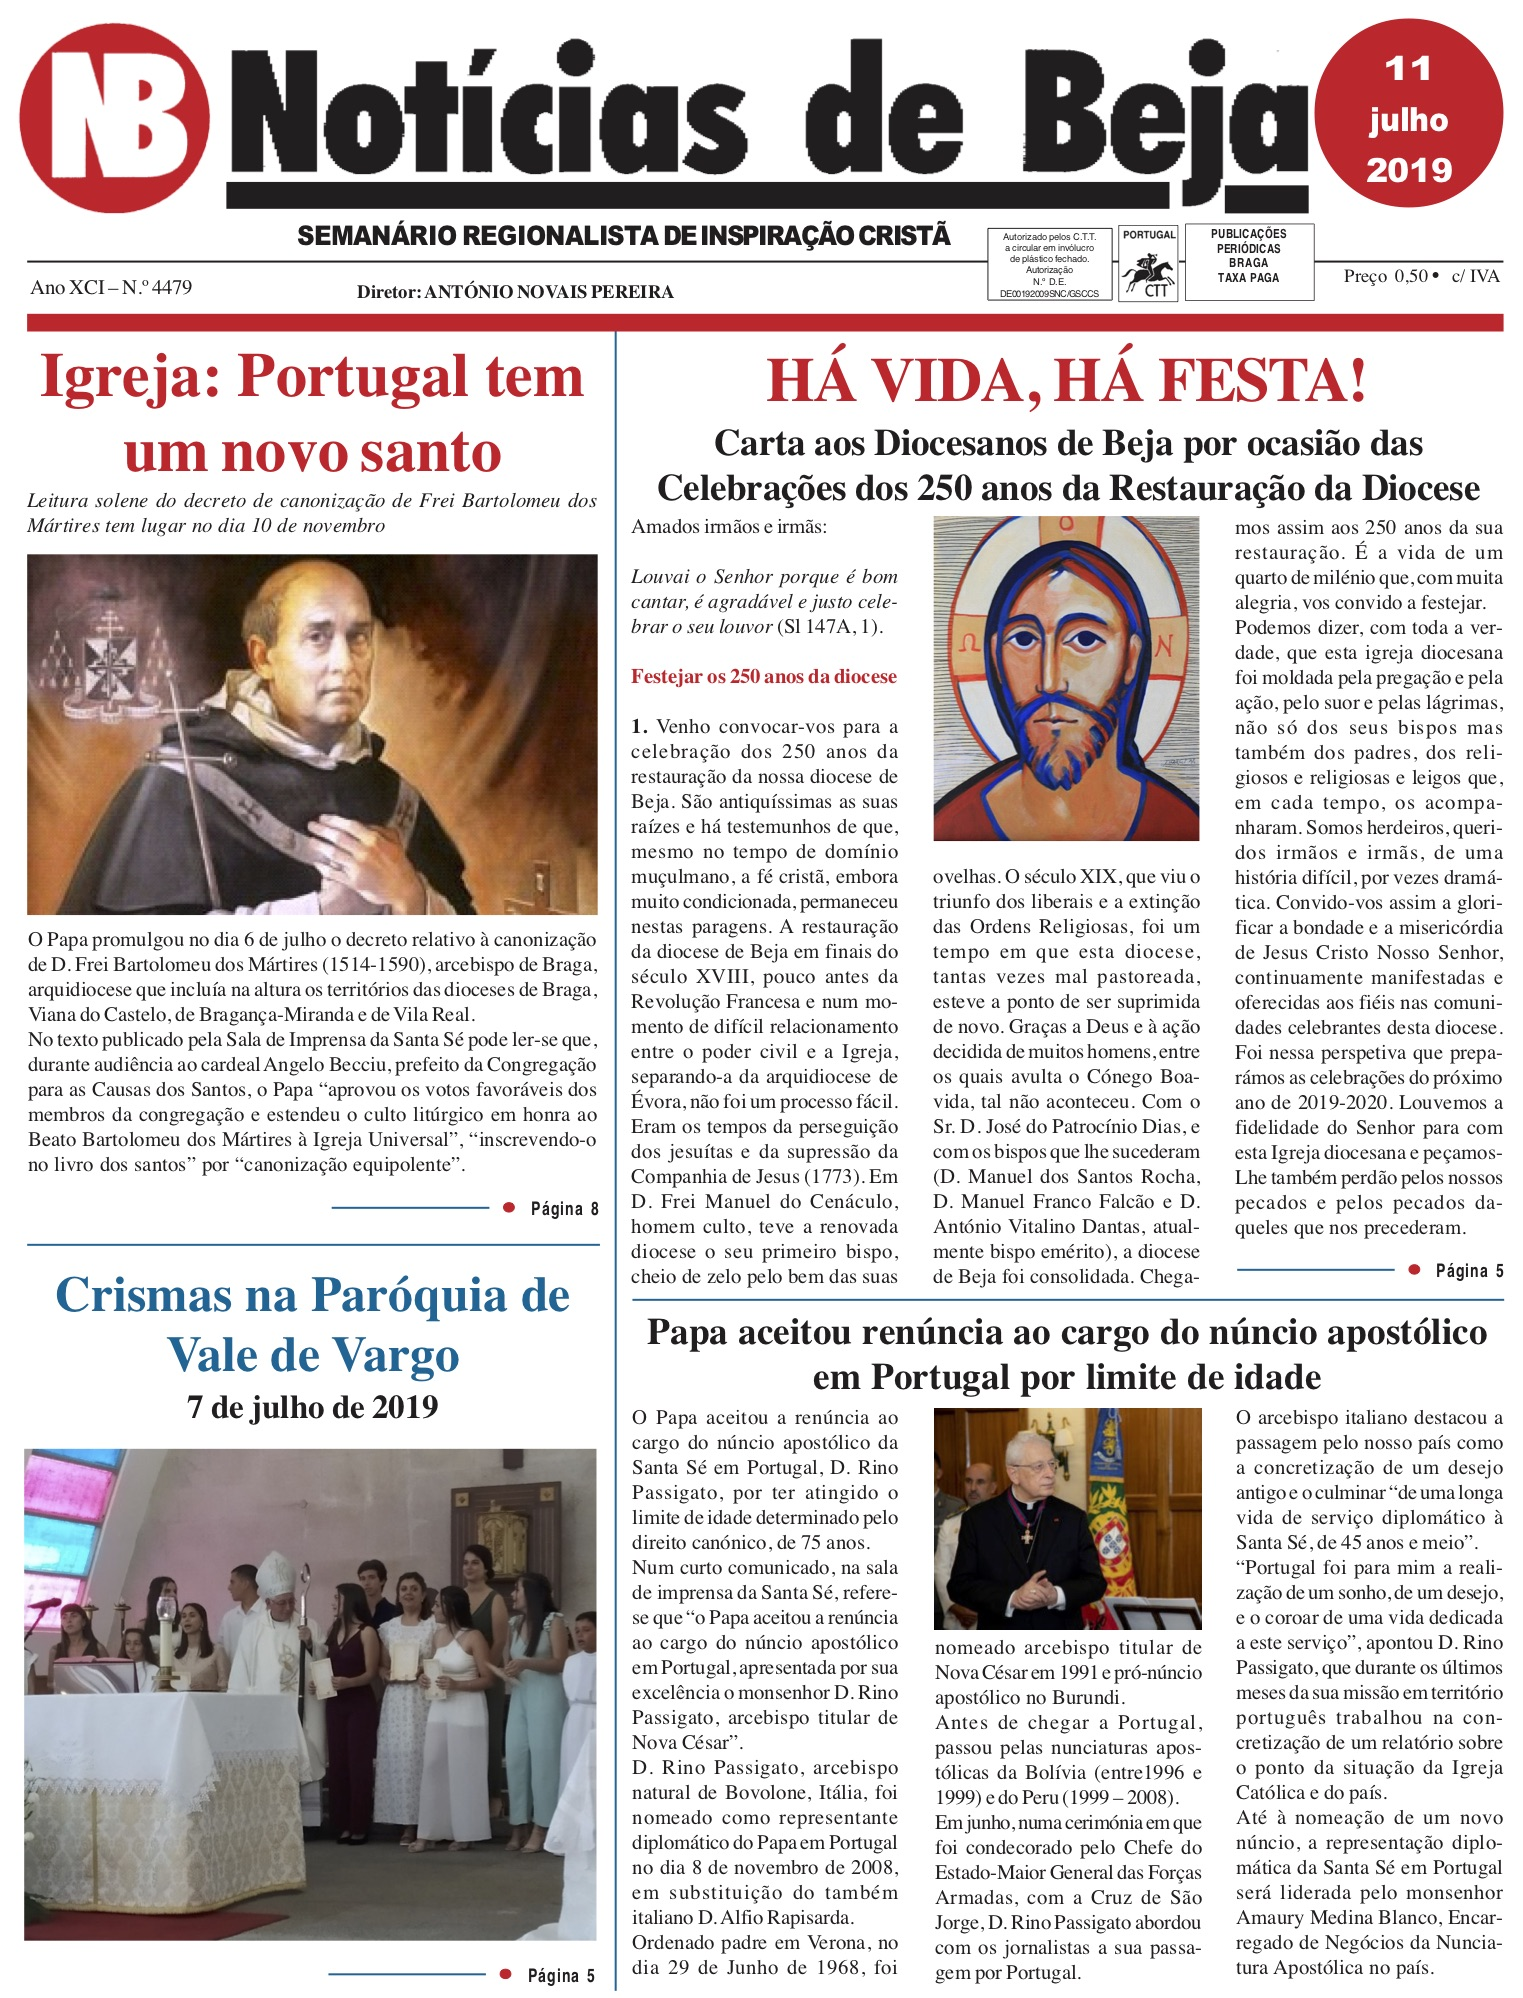 Jornal Notícias de Beja de 11 de Julho de 2019